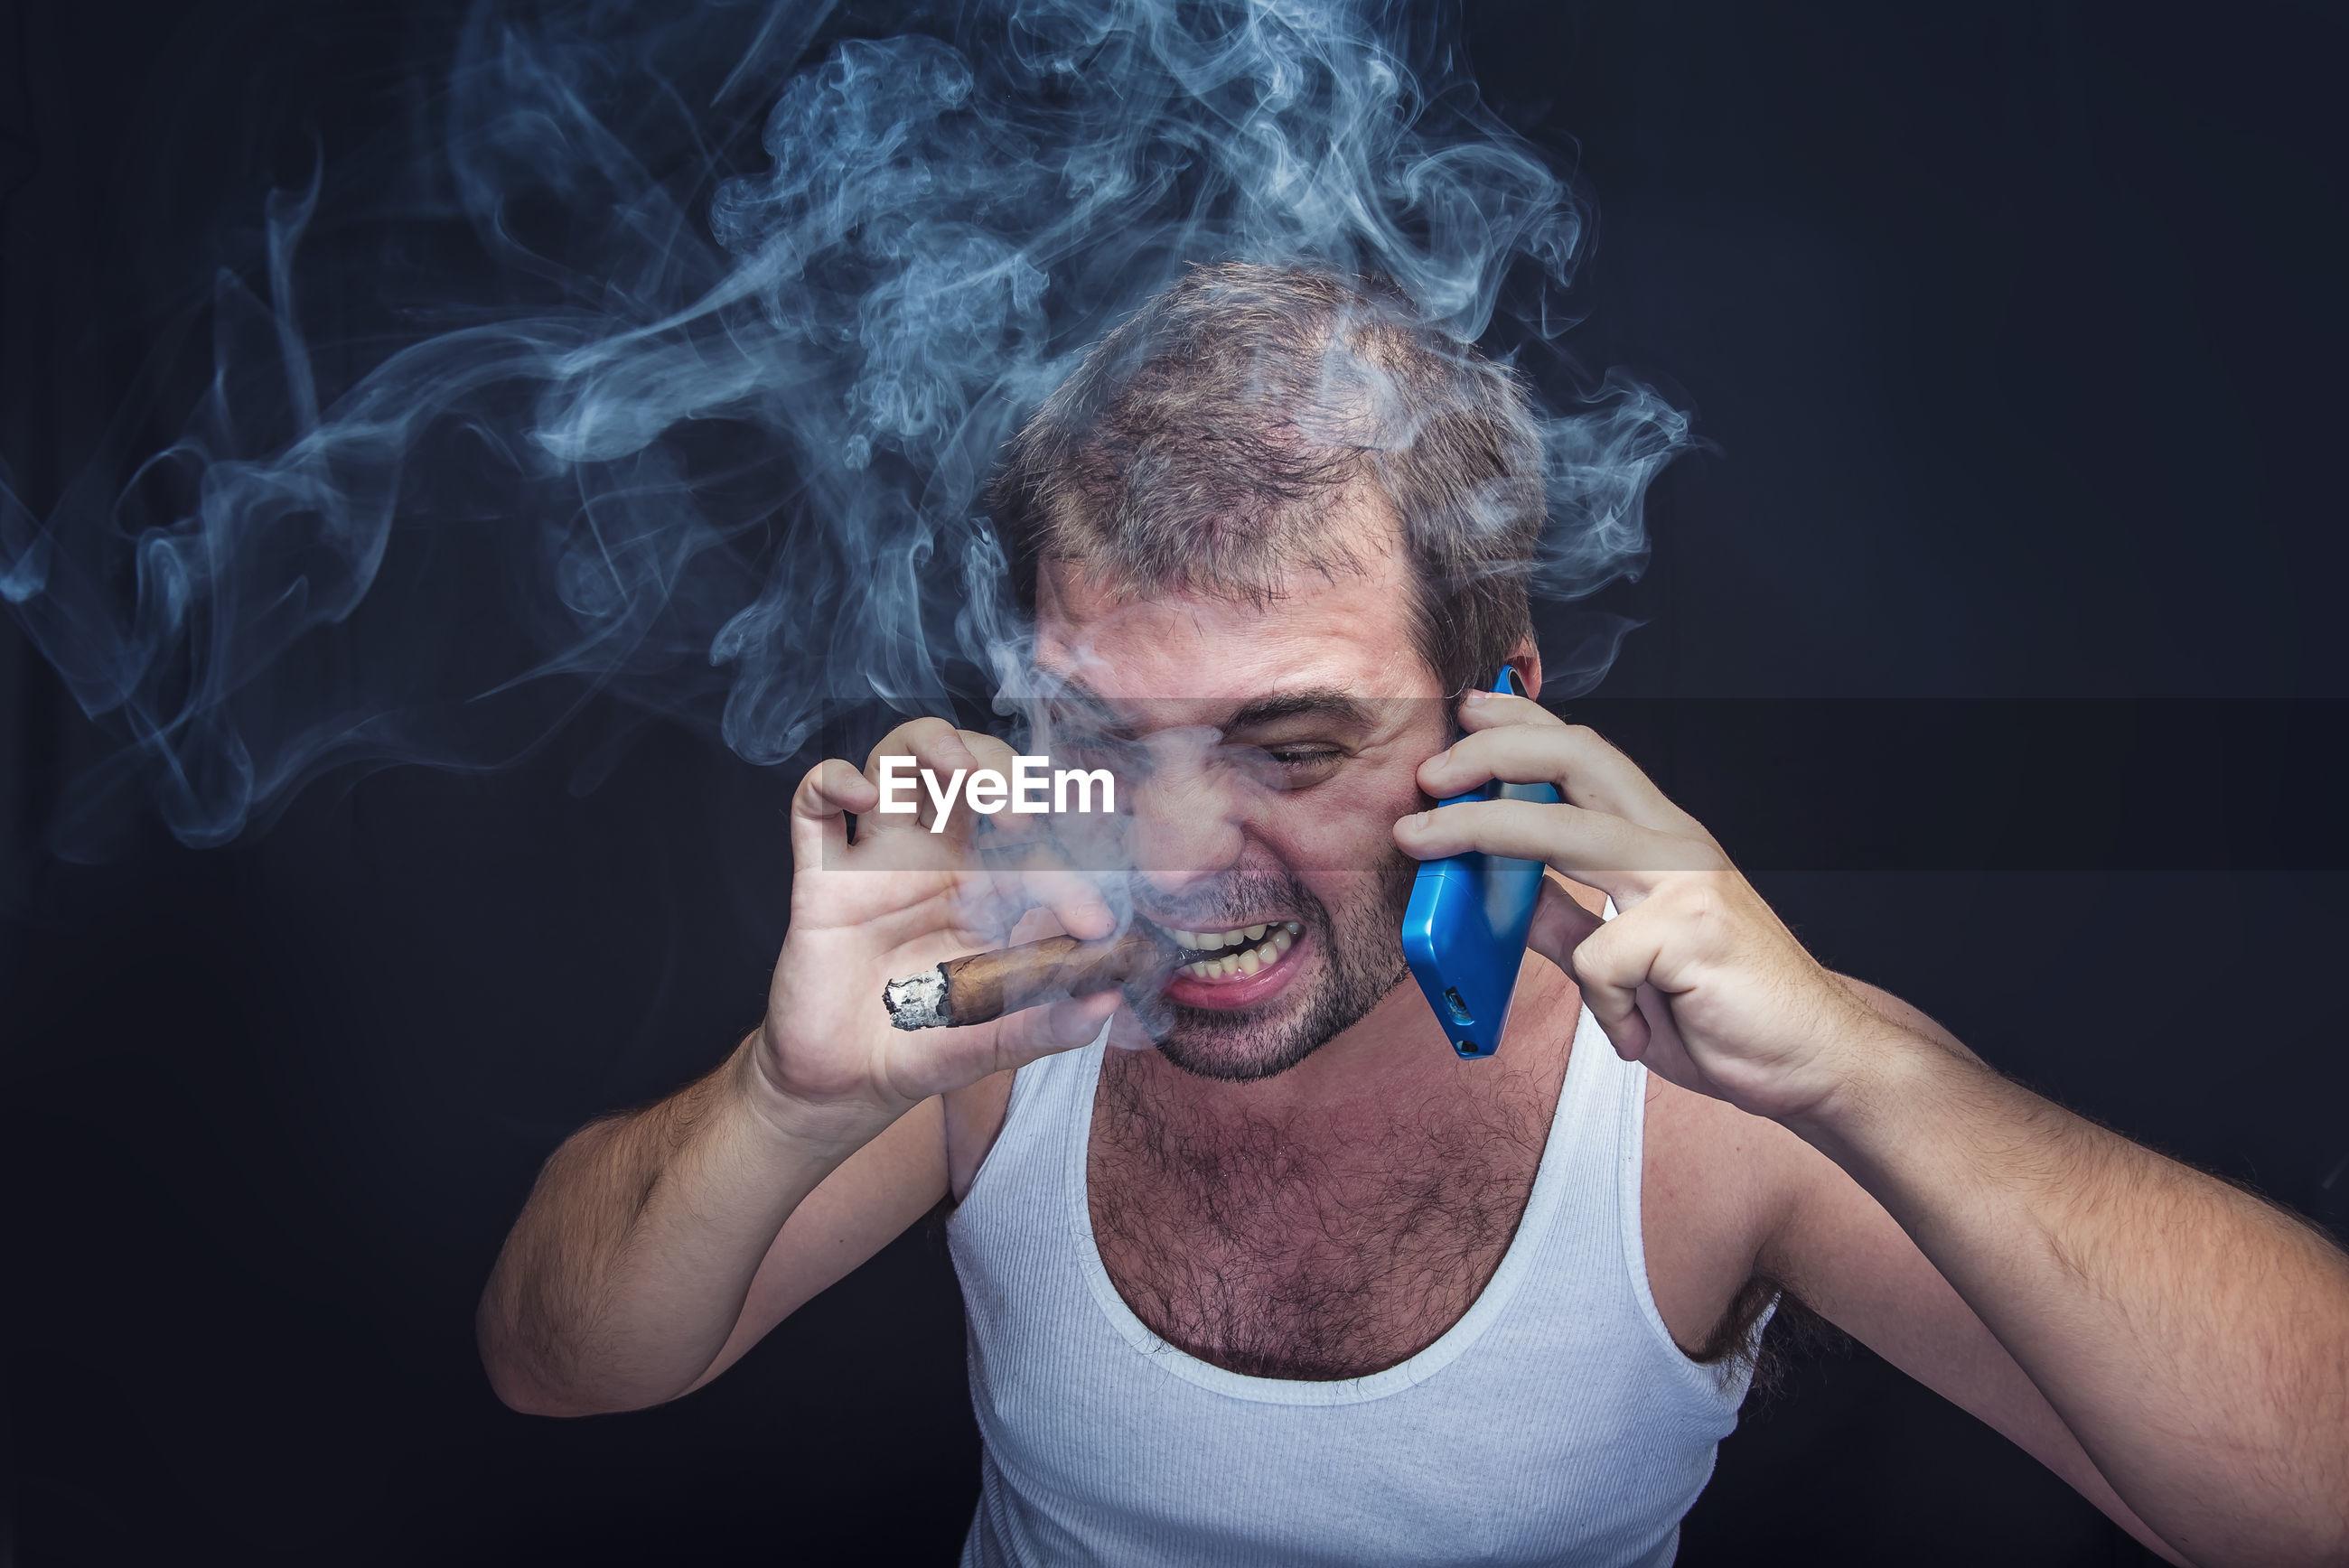 Close-up portrait of man smoking over black background